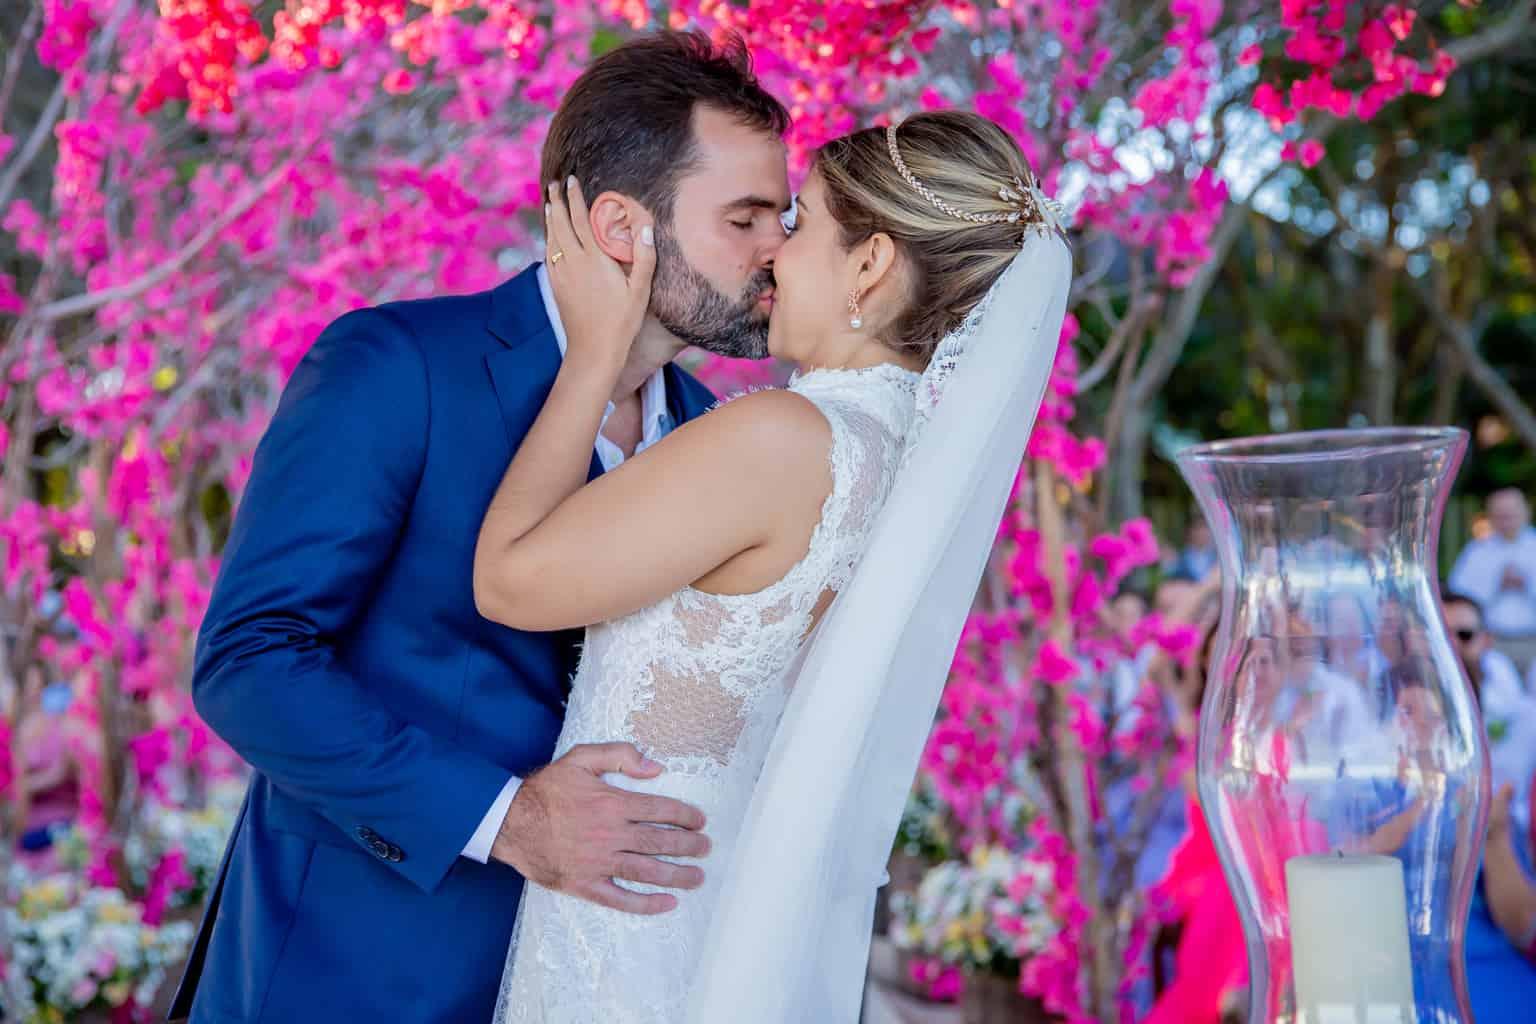 casamento-Taina-e-Hugo-Itapororoca-Villa-Trancoso-Patricia-Galvao-Sotter-Fotografia-Cerimonia-na-praia726